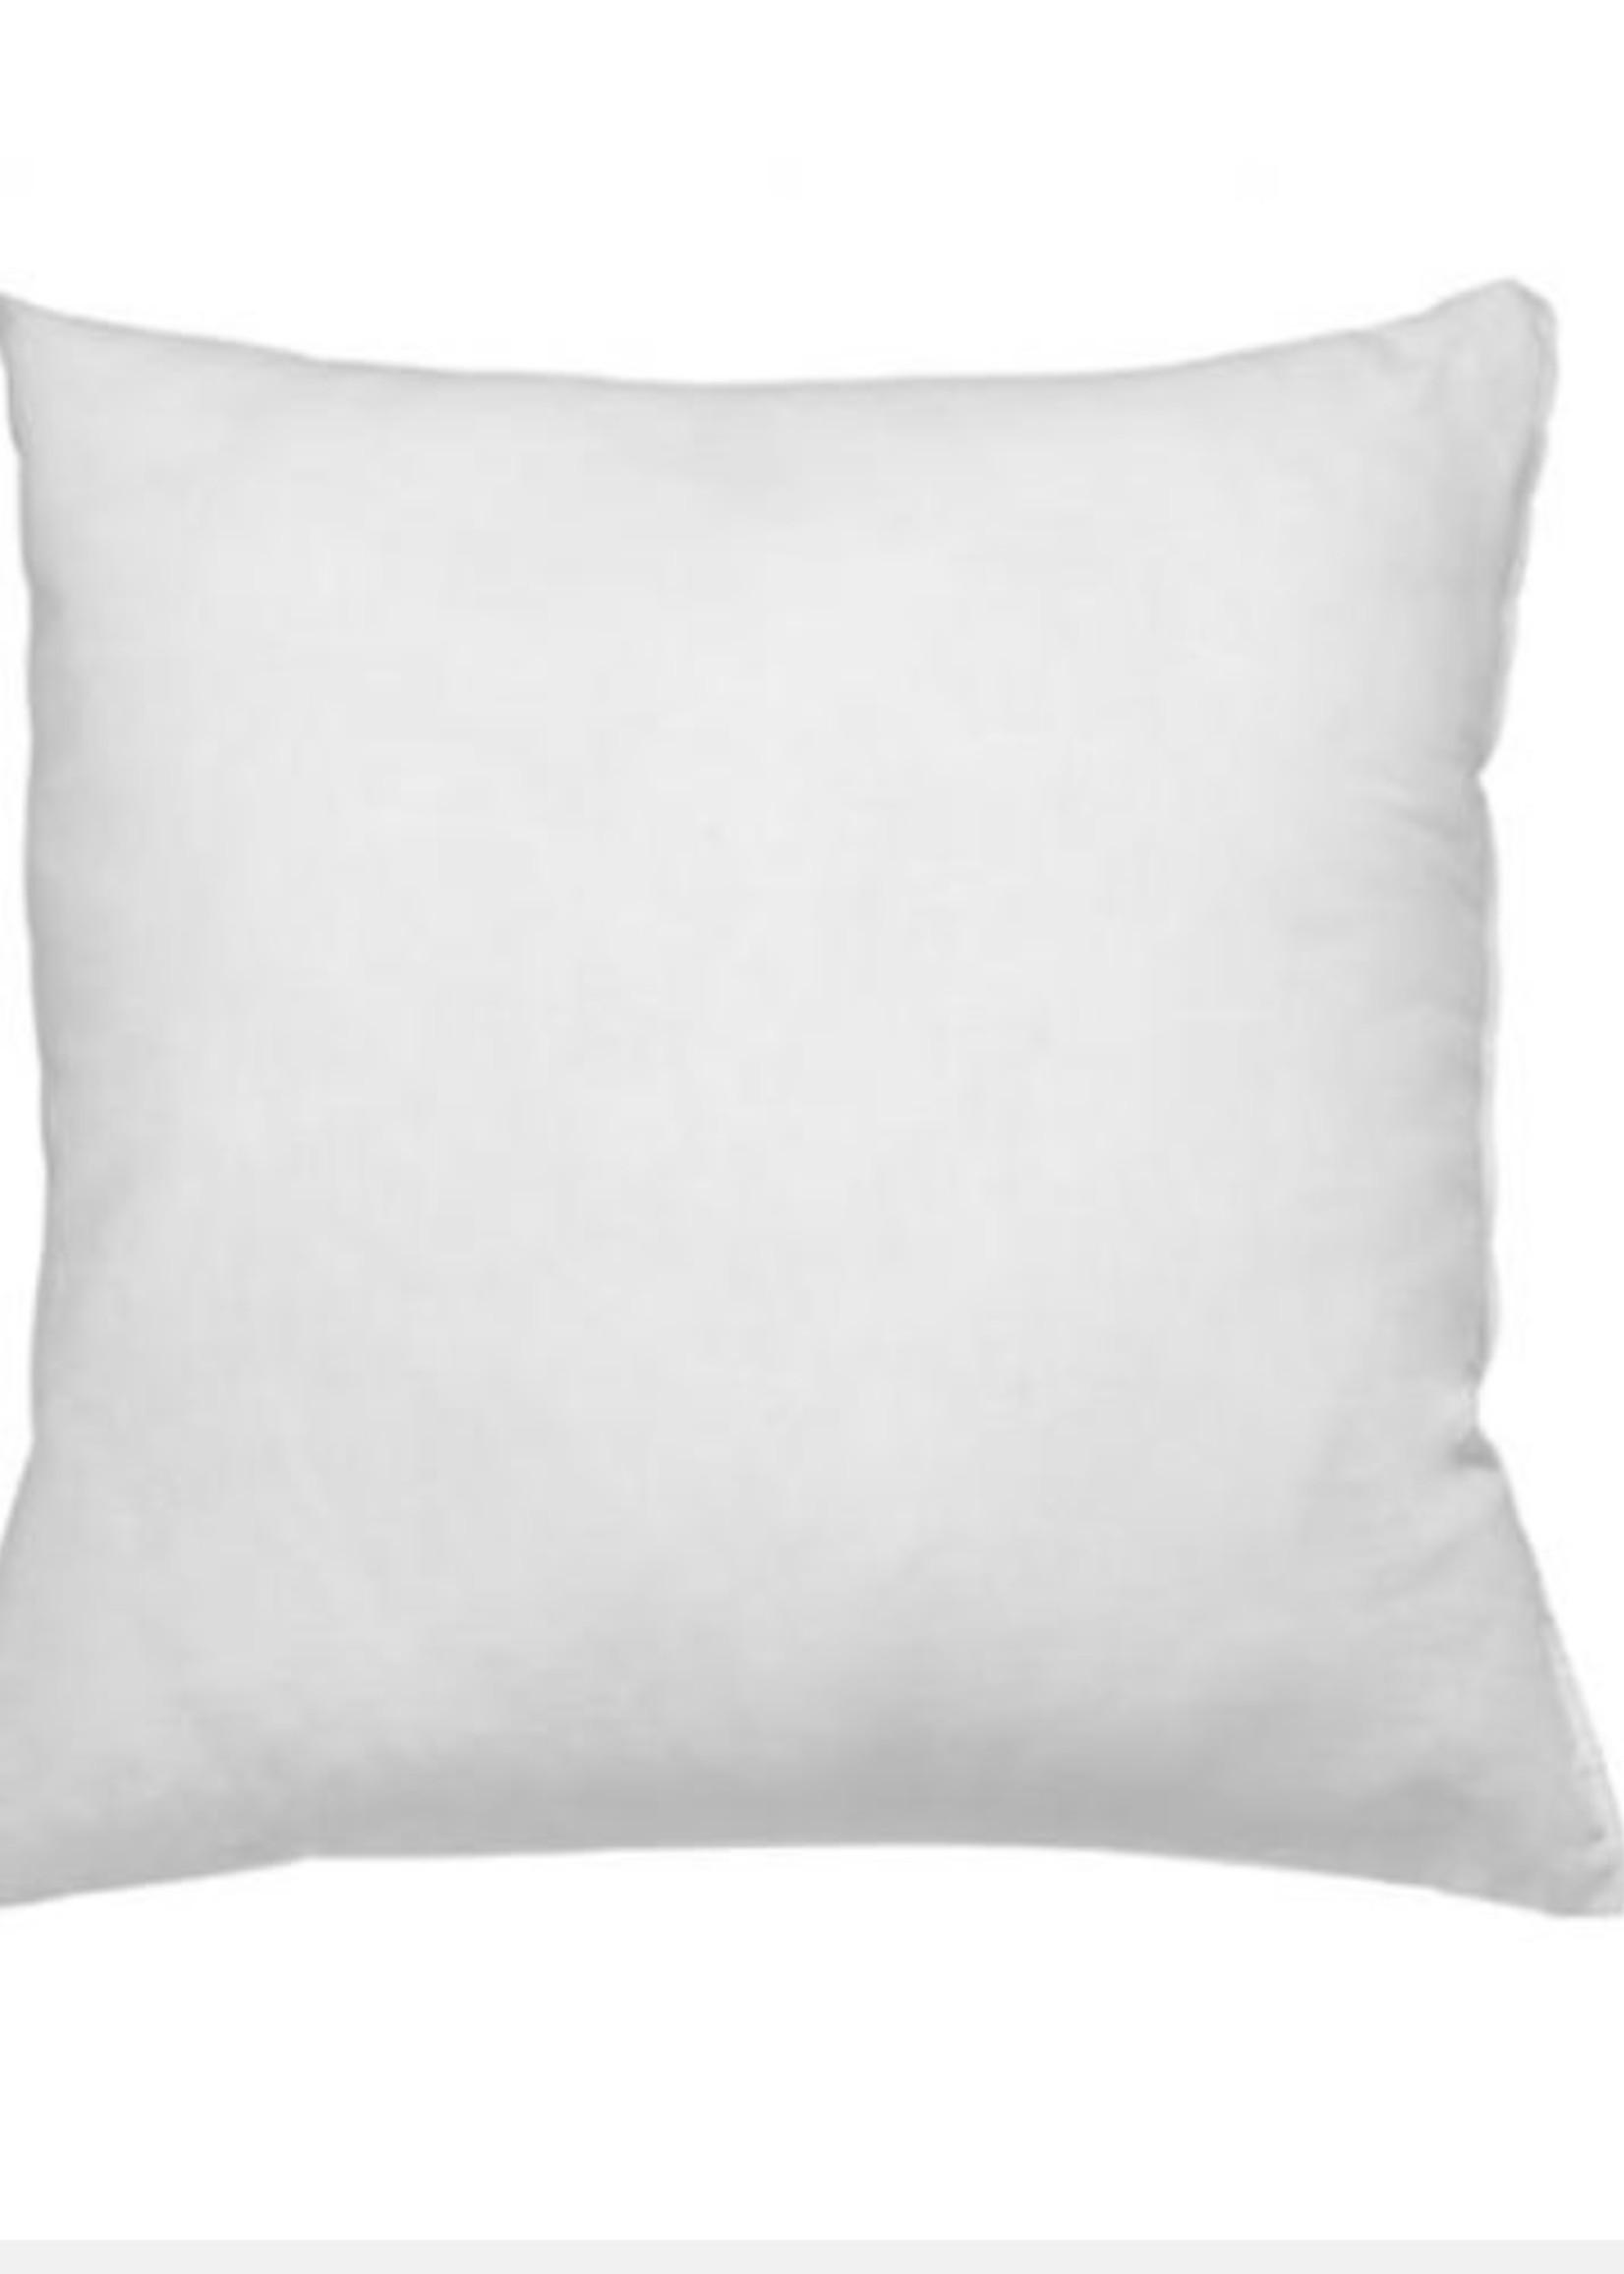 Guts & Goats White Inner Cushion Square 60x60